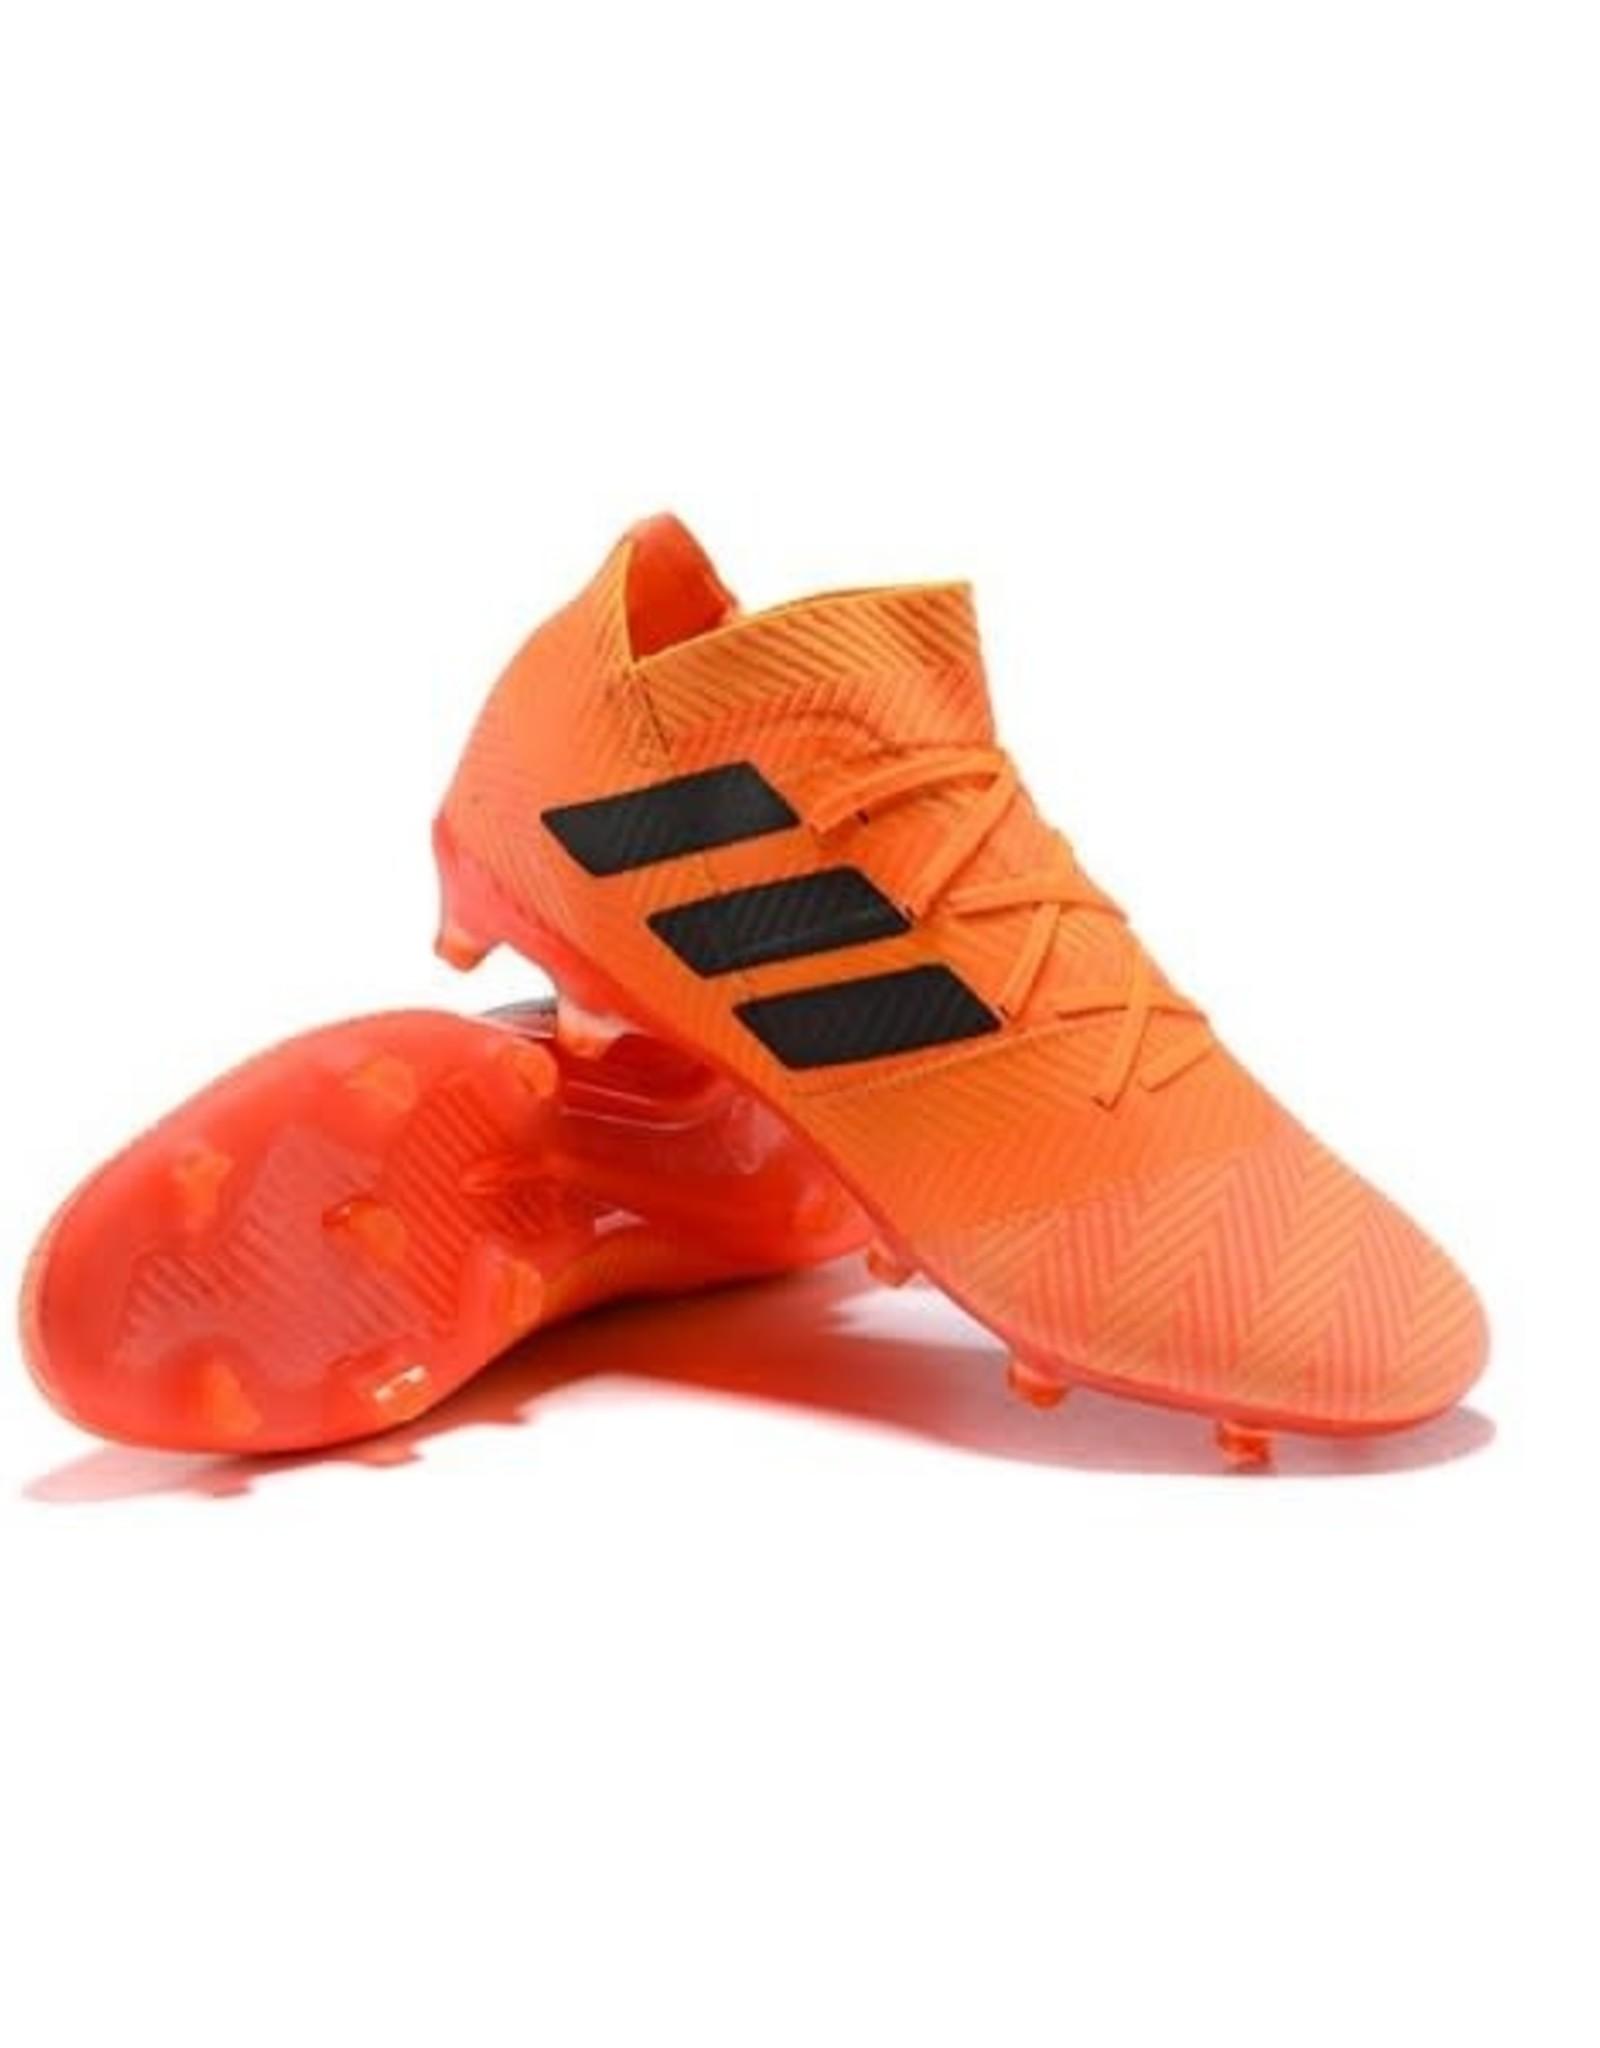 Adidas Adidas Nemeziz 18.1 FG Soccer Cleats